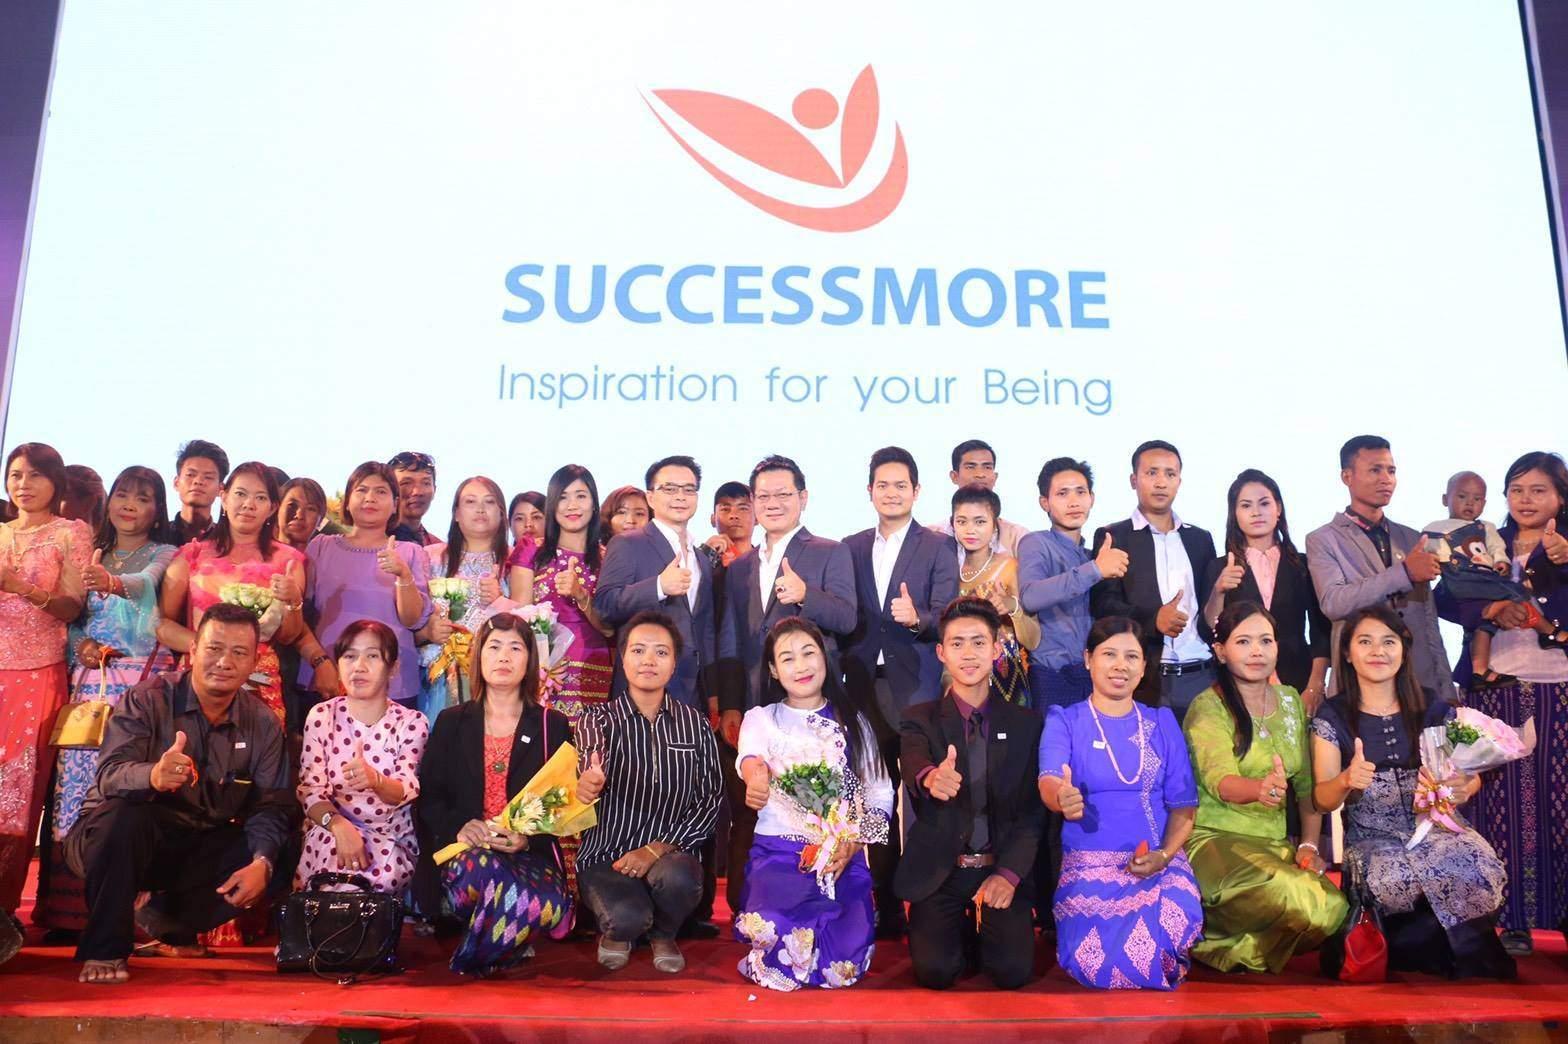 SUCCESSMORE Inspiration ครั้งที่ 17 เมืองย่างกุ้ง ประเทศเมียนมาร์ (1)